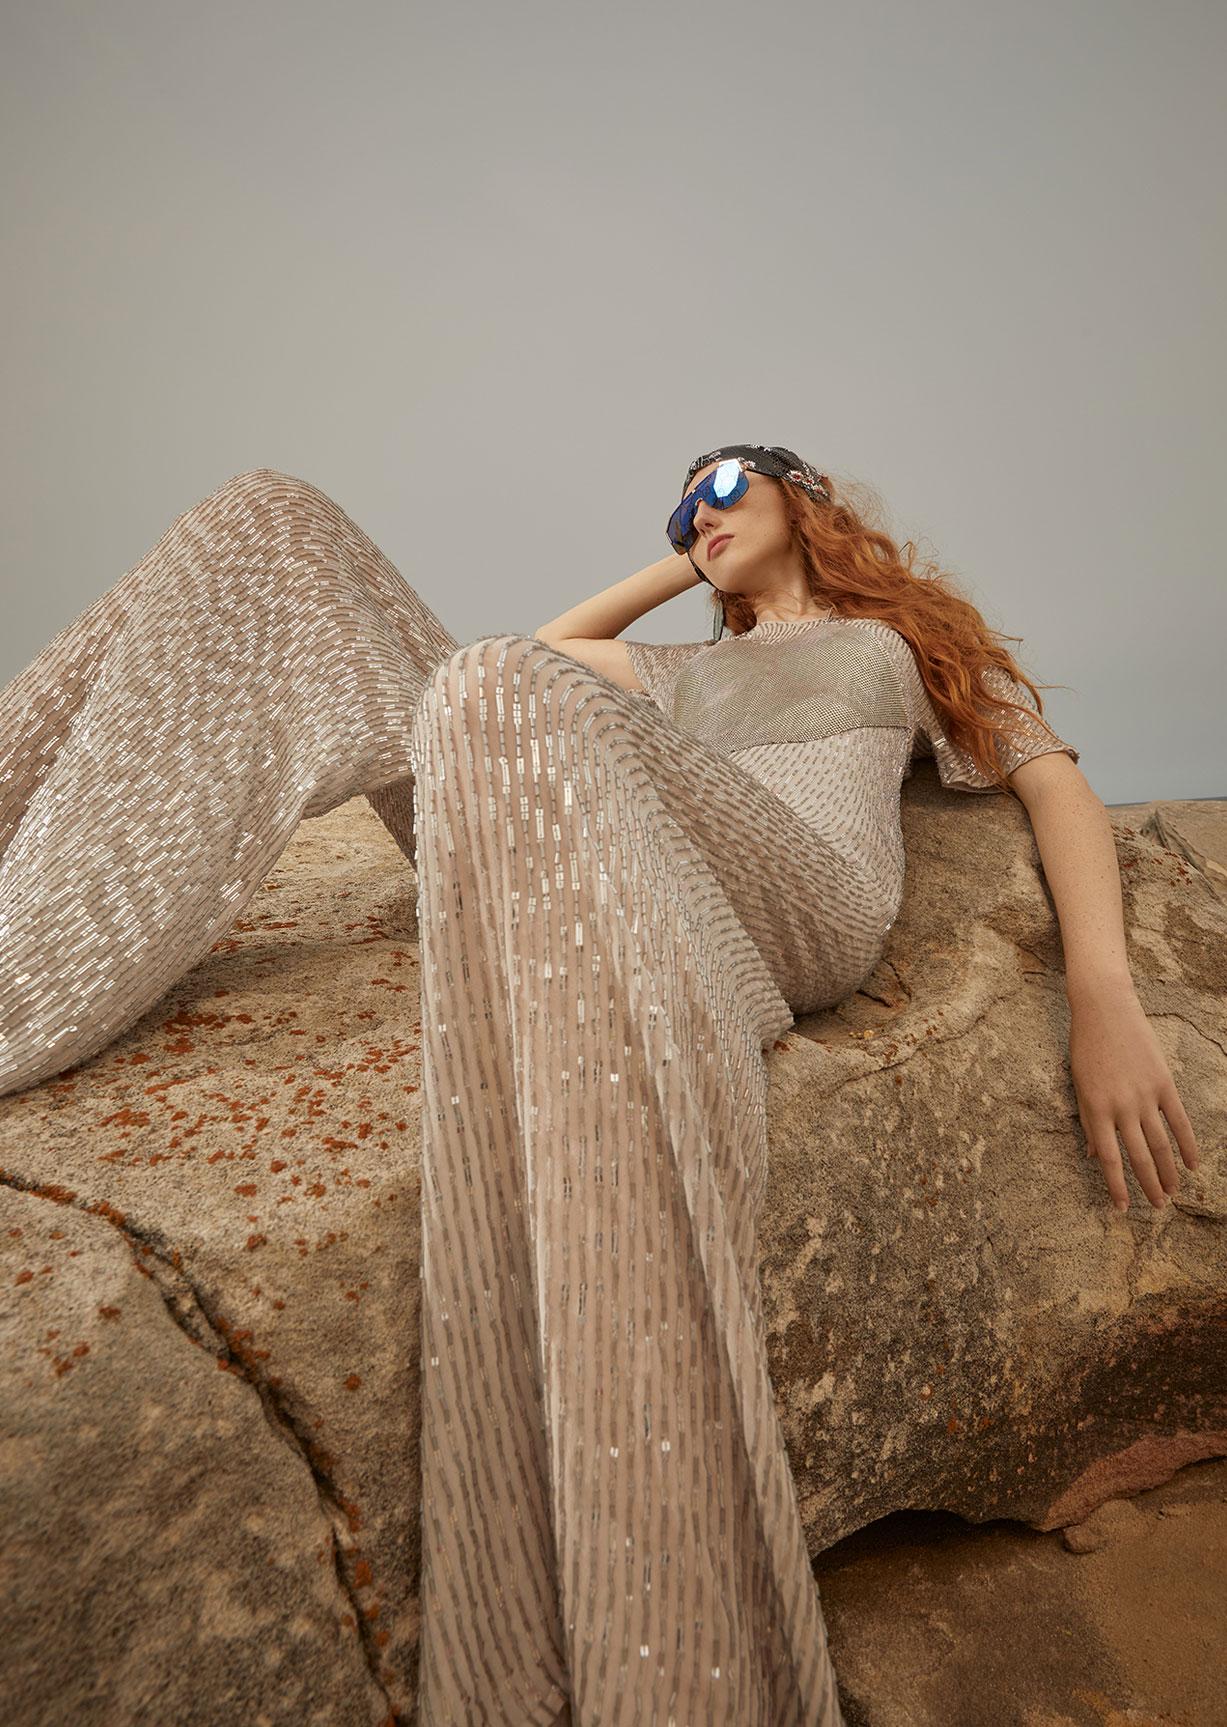 Модный маскарад в журнале Grazia / фото 10